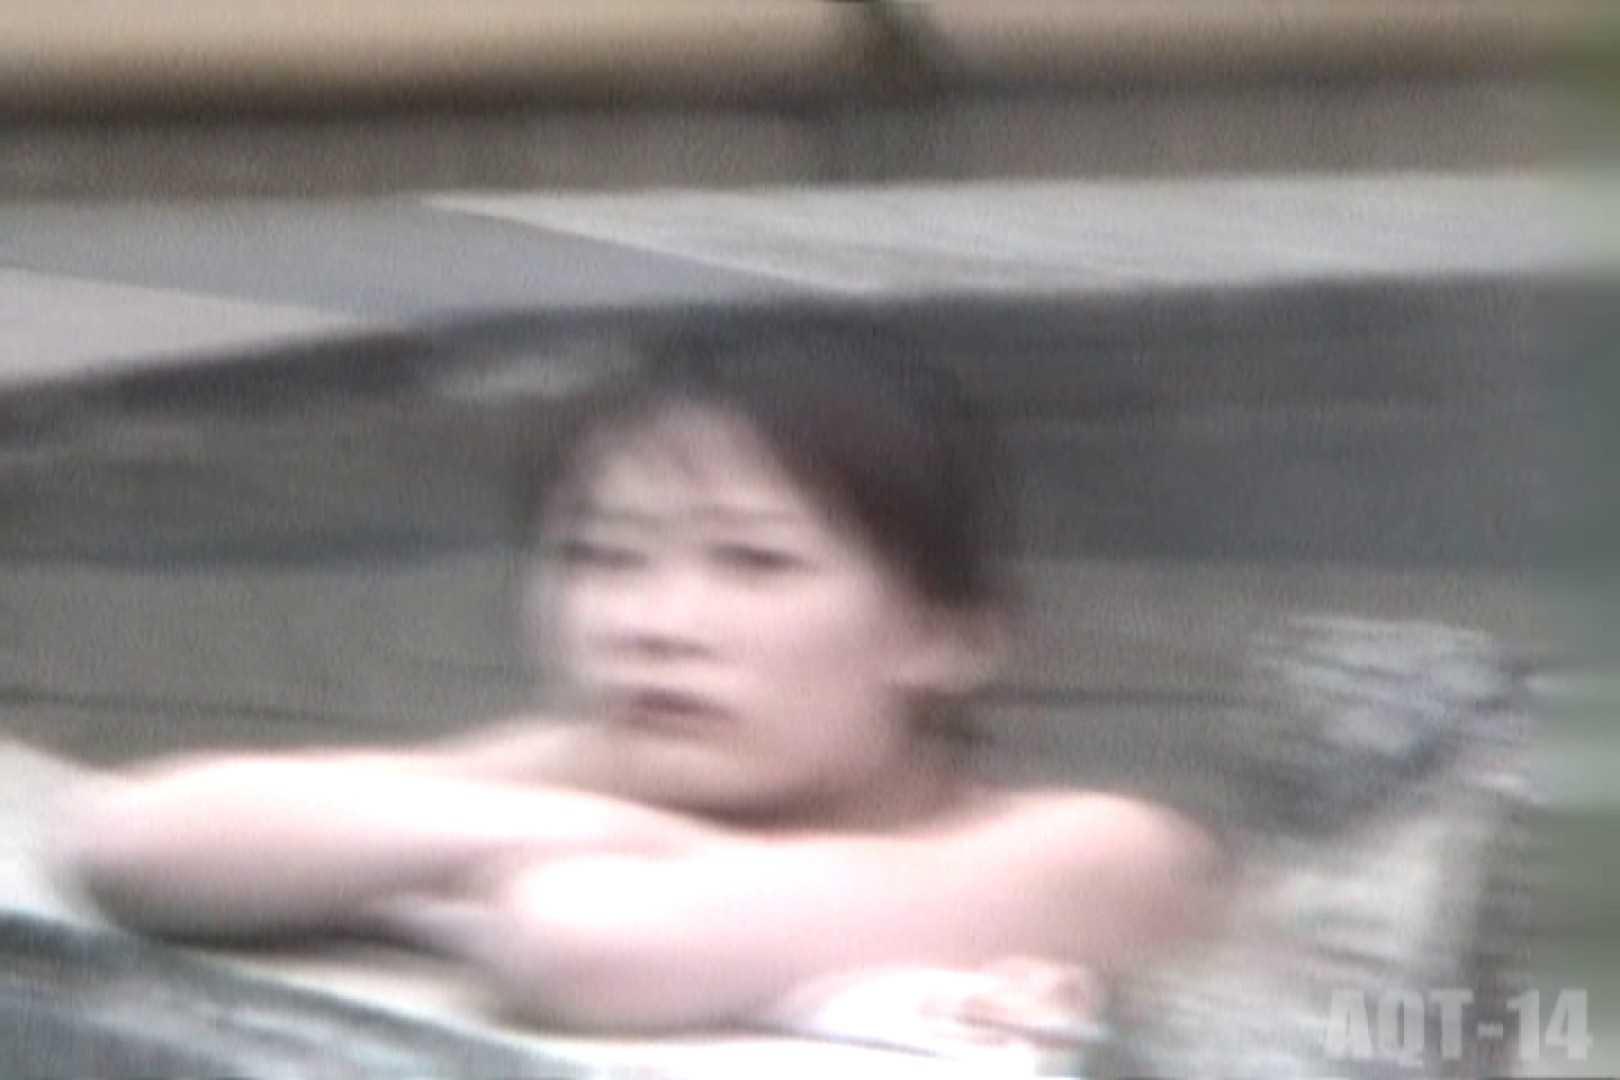 Aquaな露天風呂Vol.822 盗撮大放出 エロ無料画像 98連発 14